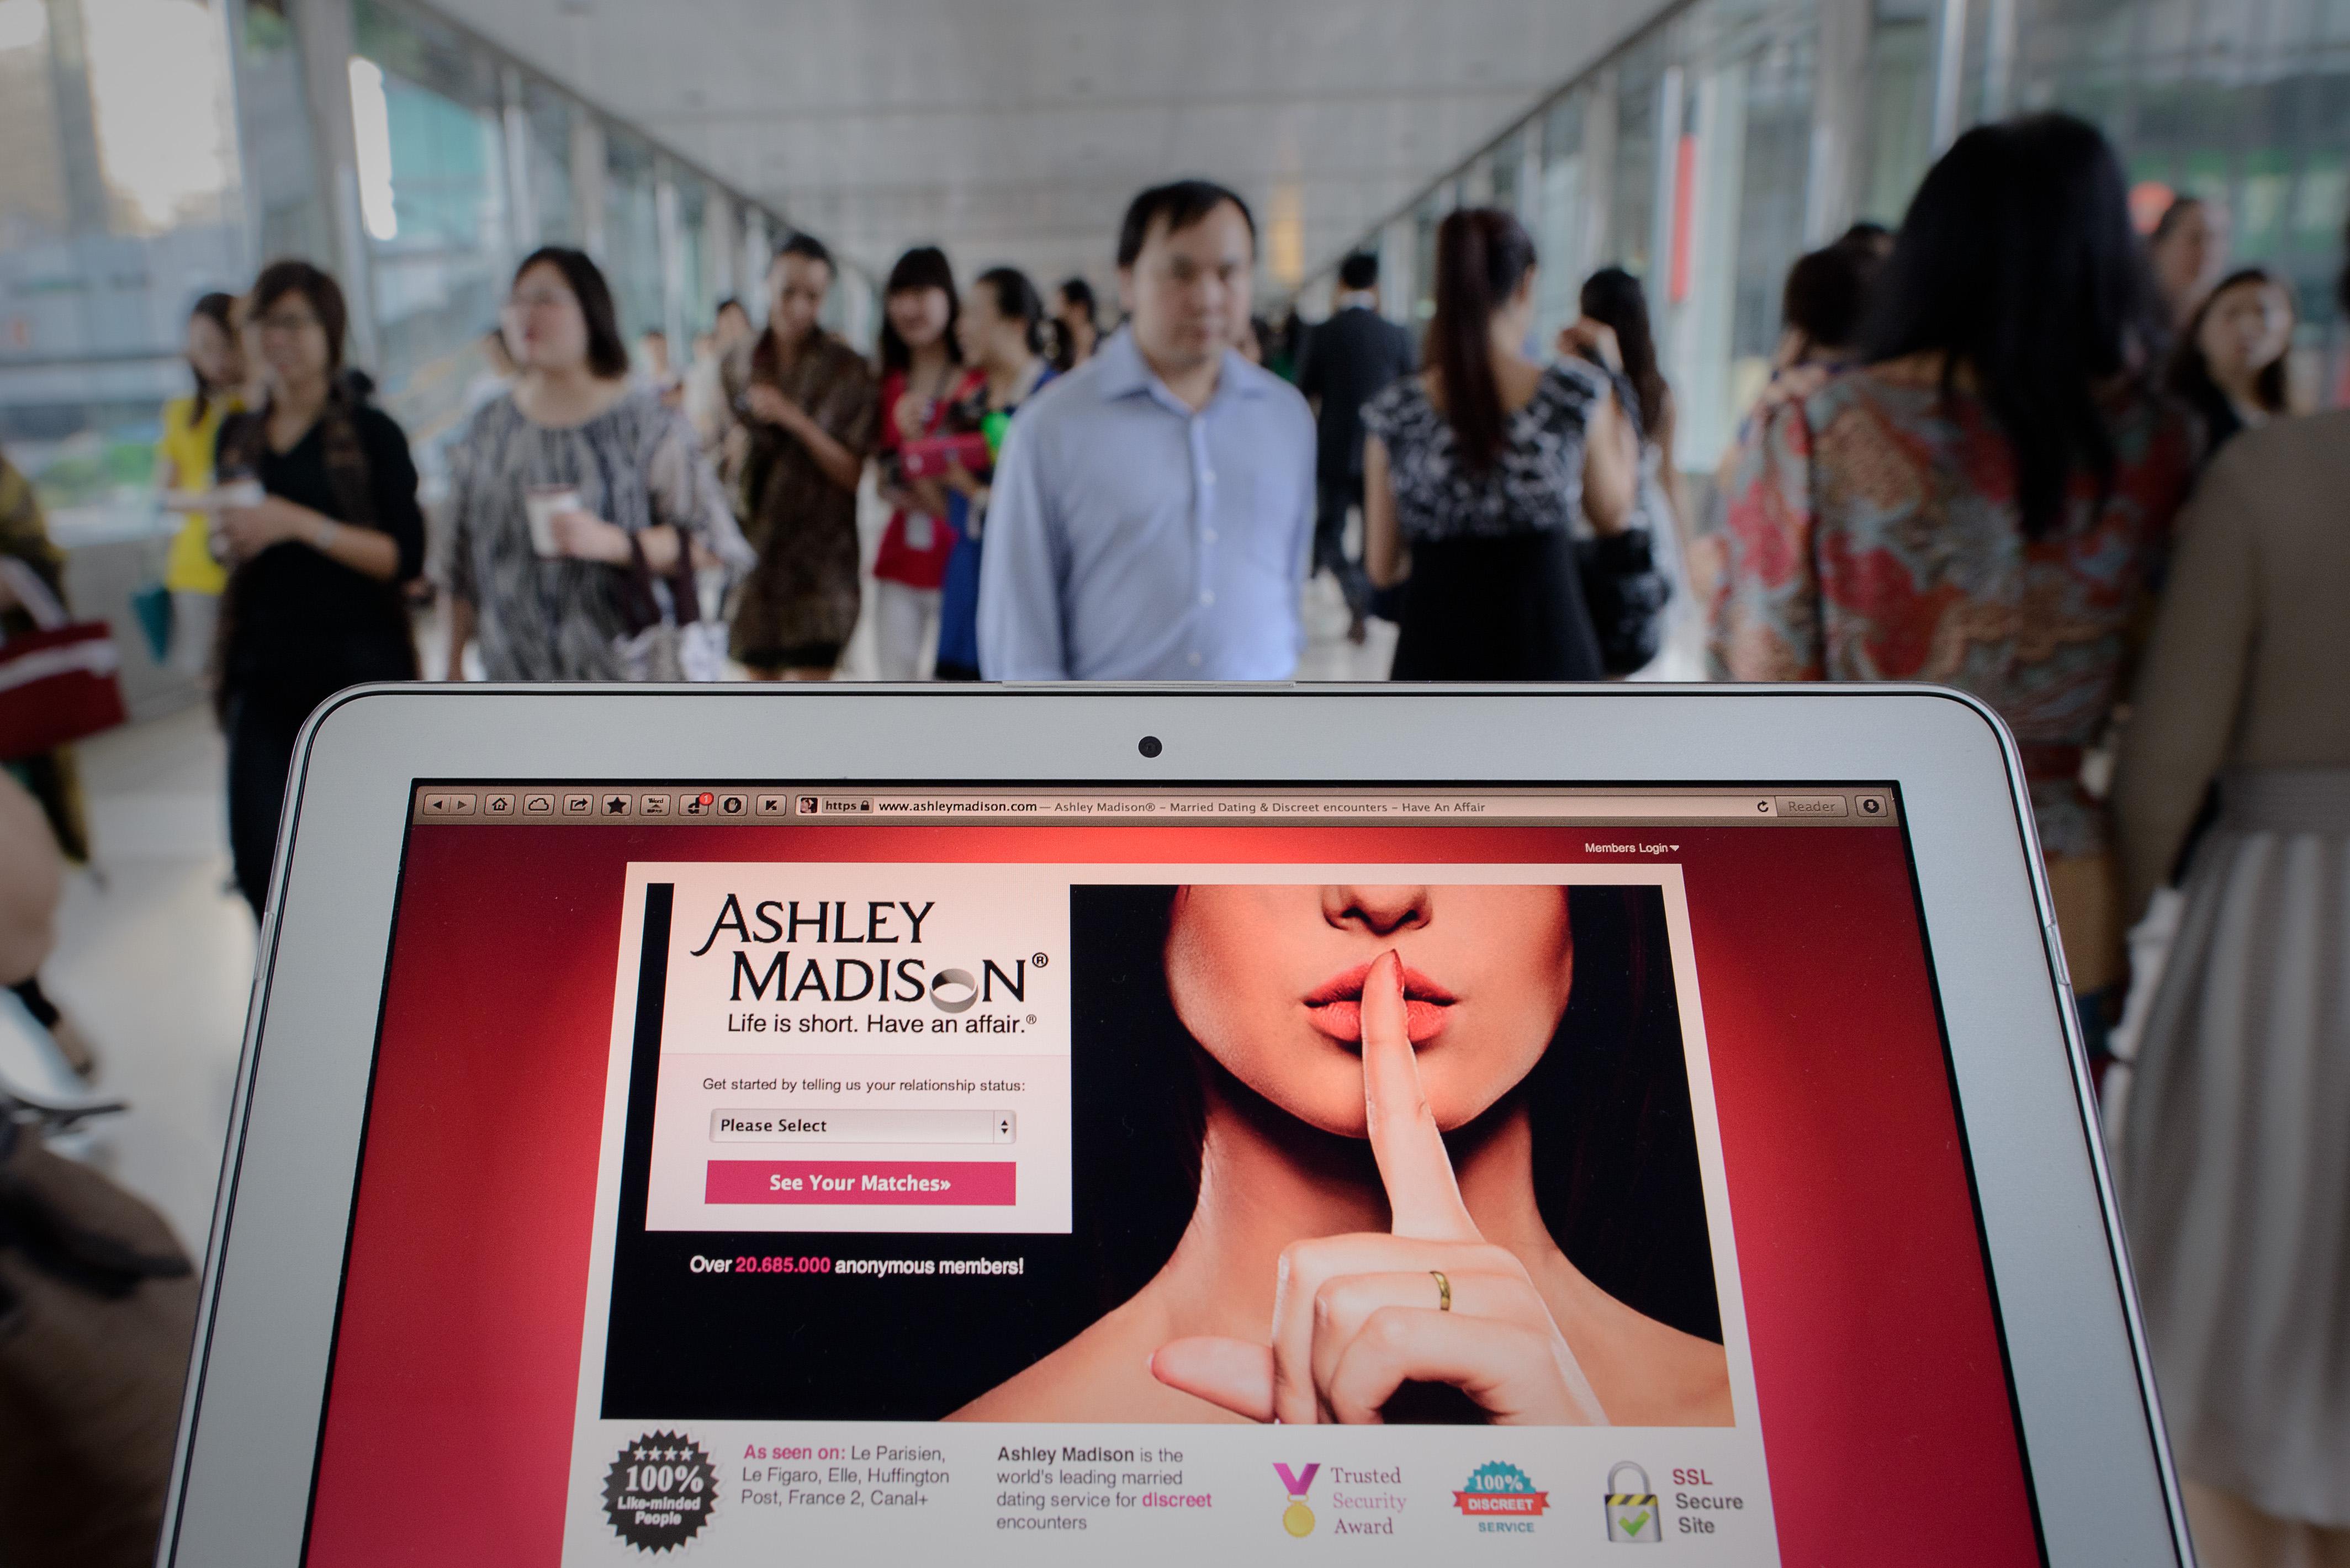 HONG KONG-LIFESTYLE-INTERNET-SEX